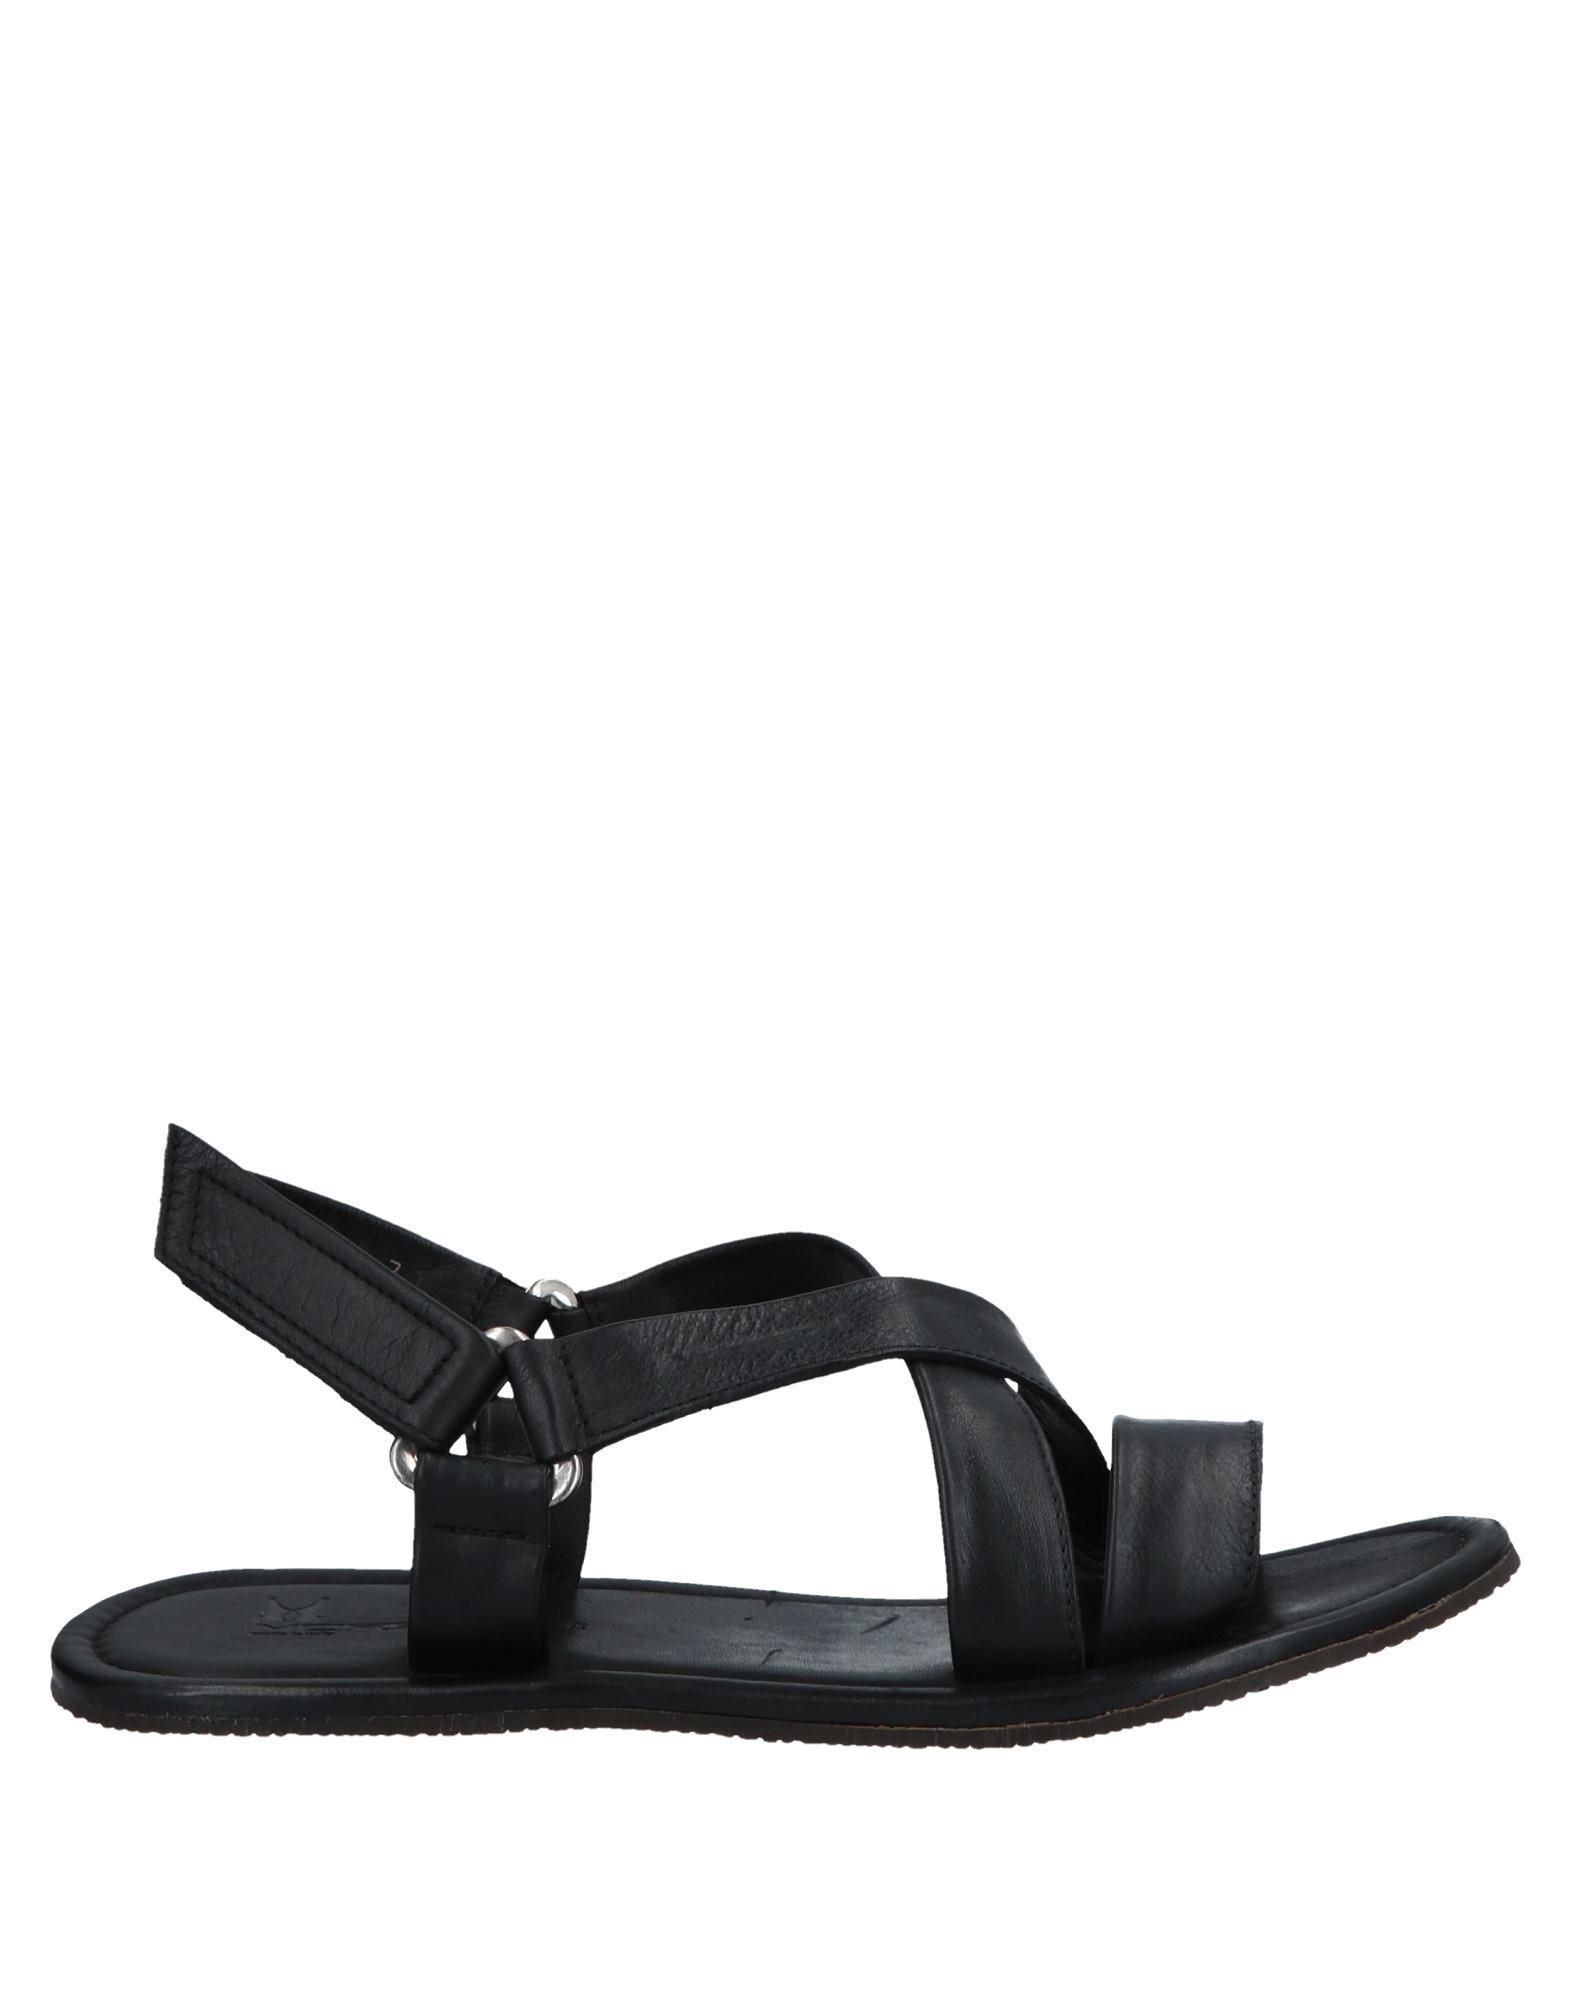 06b2a6dd726fa Lyst - Moreschi Sandals in Black for Men